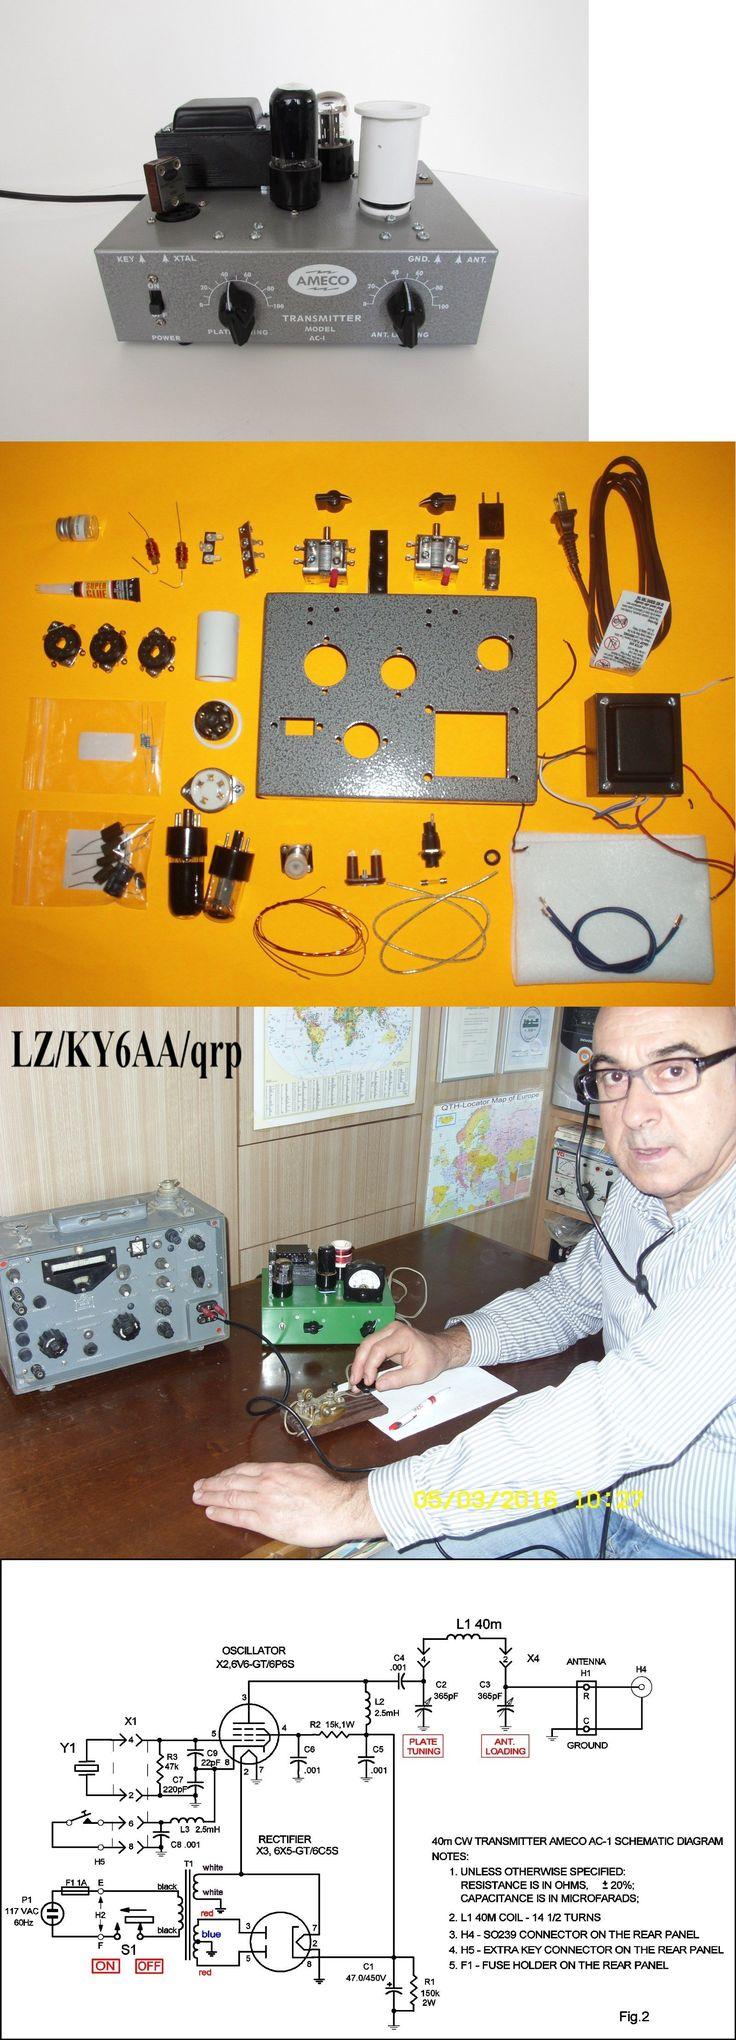 Ham Radio Transmitters: Ameco Ac-1 Transmitter Diy (Do It Yourself ) Replica Kit 40M Ham Radio Band -> BUY IT NOW ONLY: $188.81 on eBay!